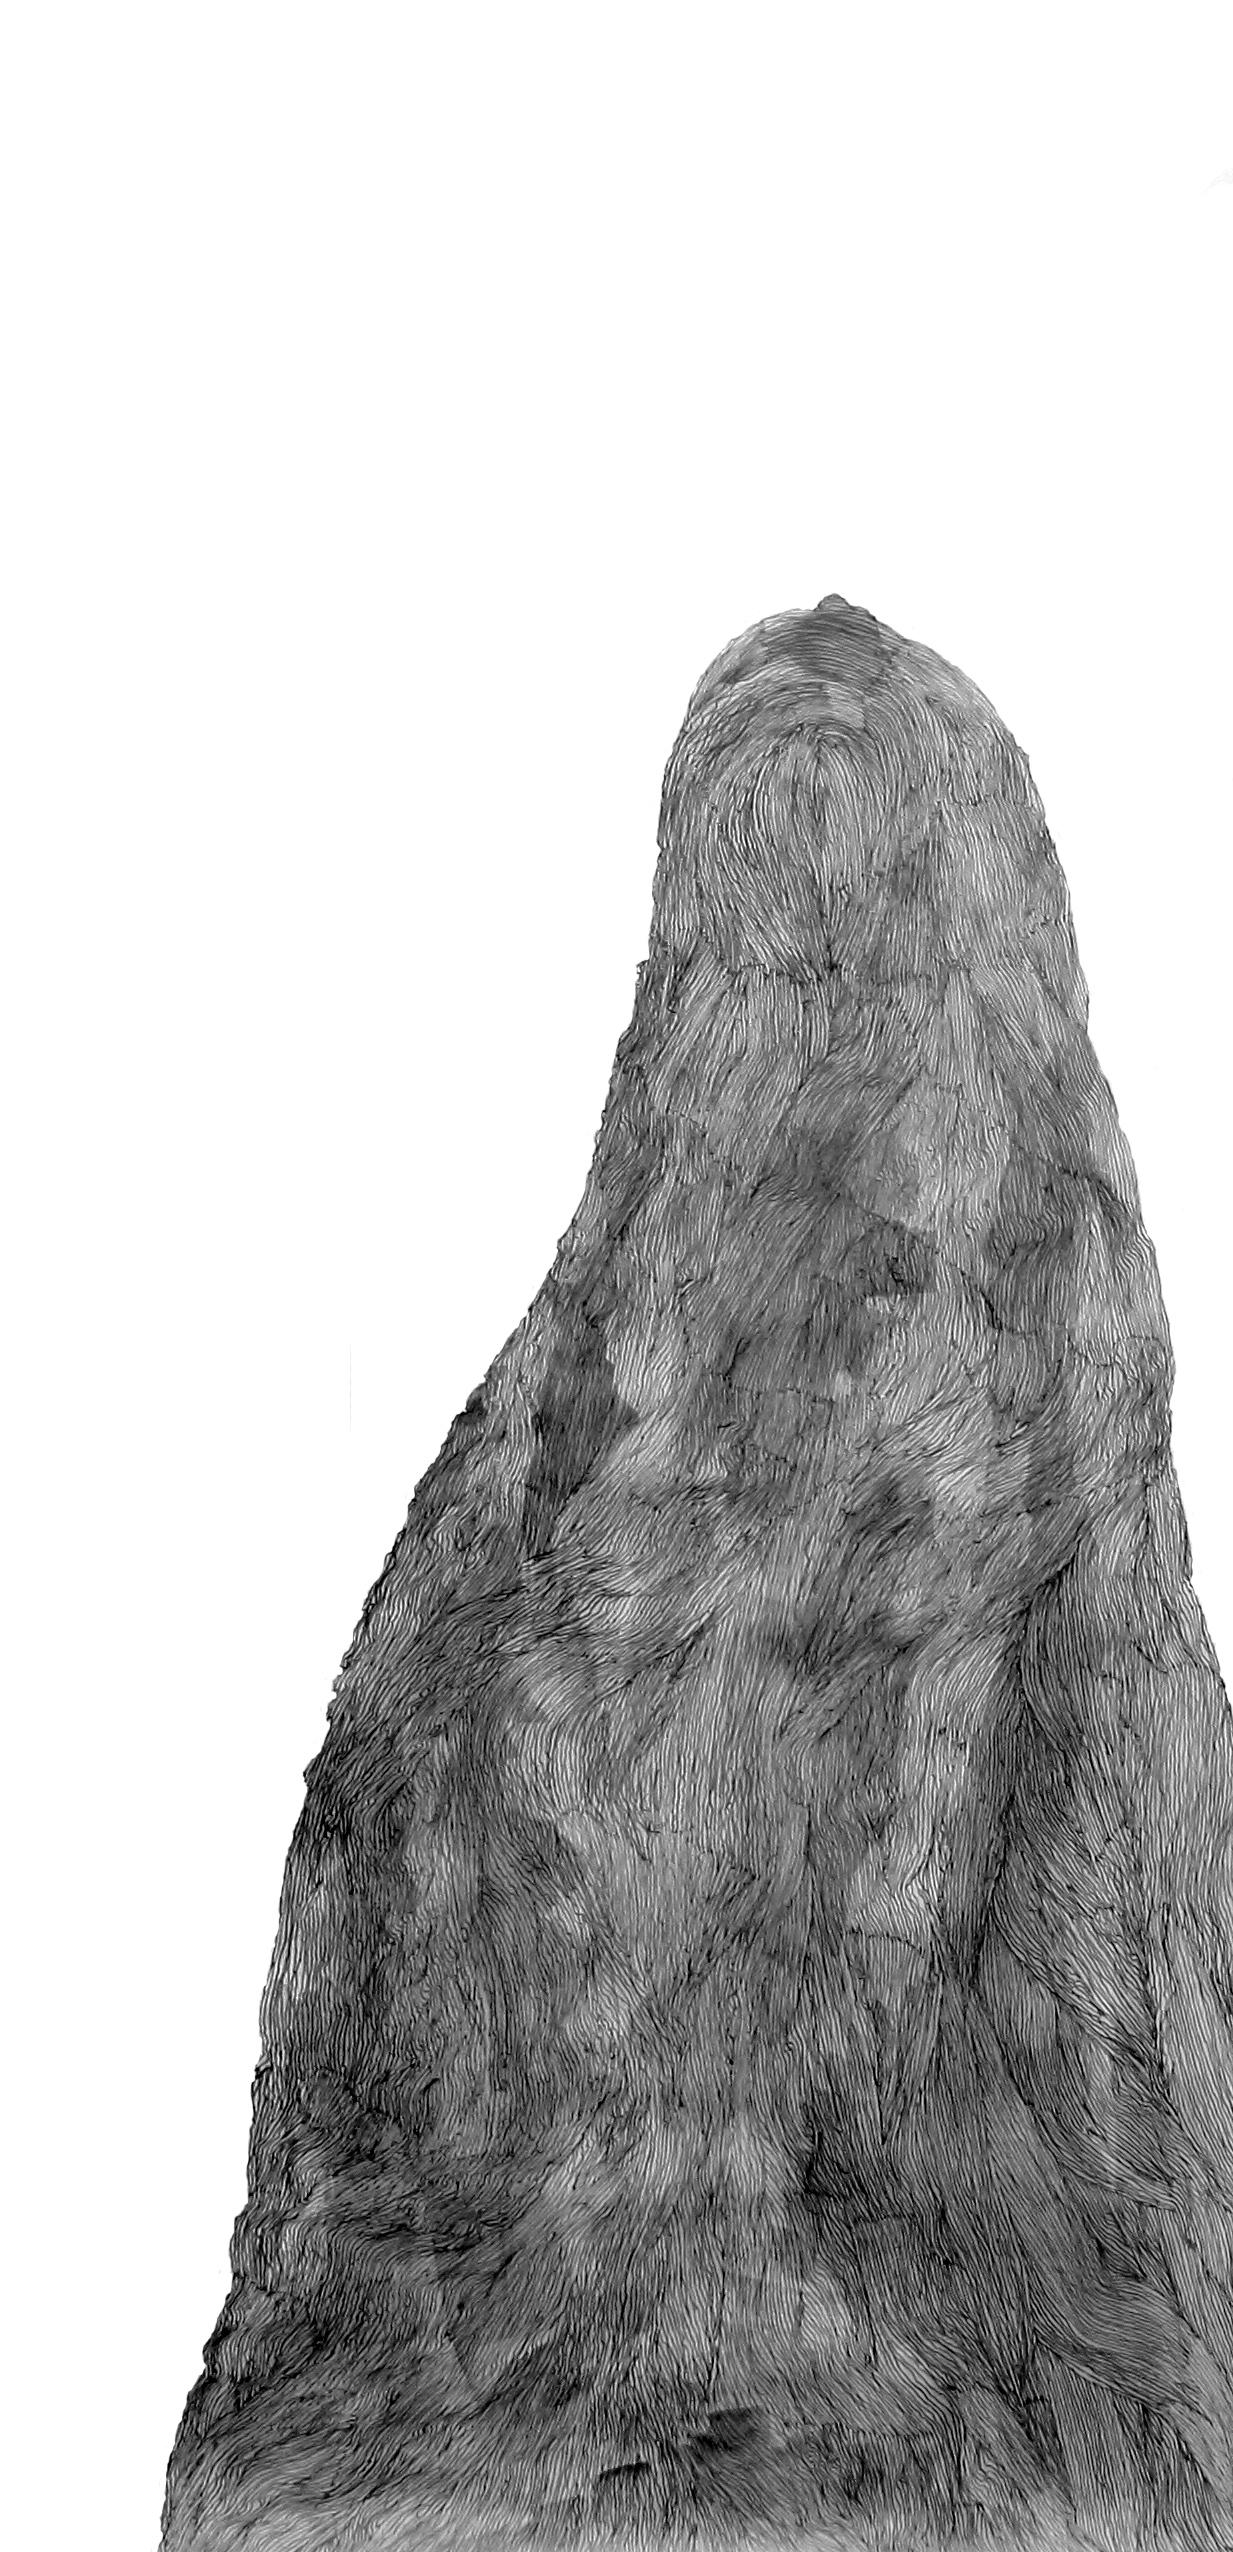 Fur Mountain , Pencil on paper, 150 x 68 cm, 2017